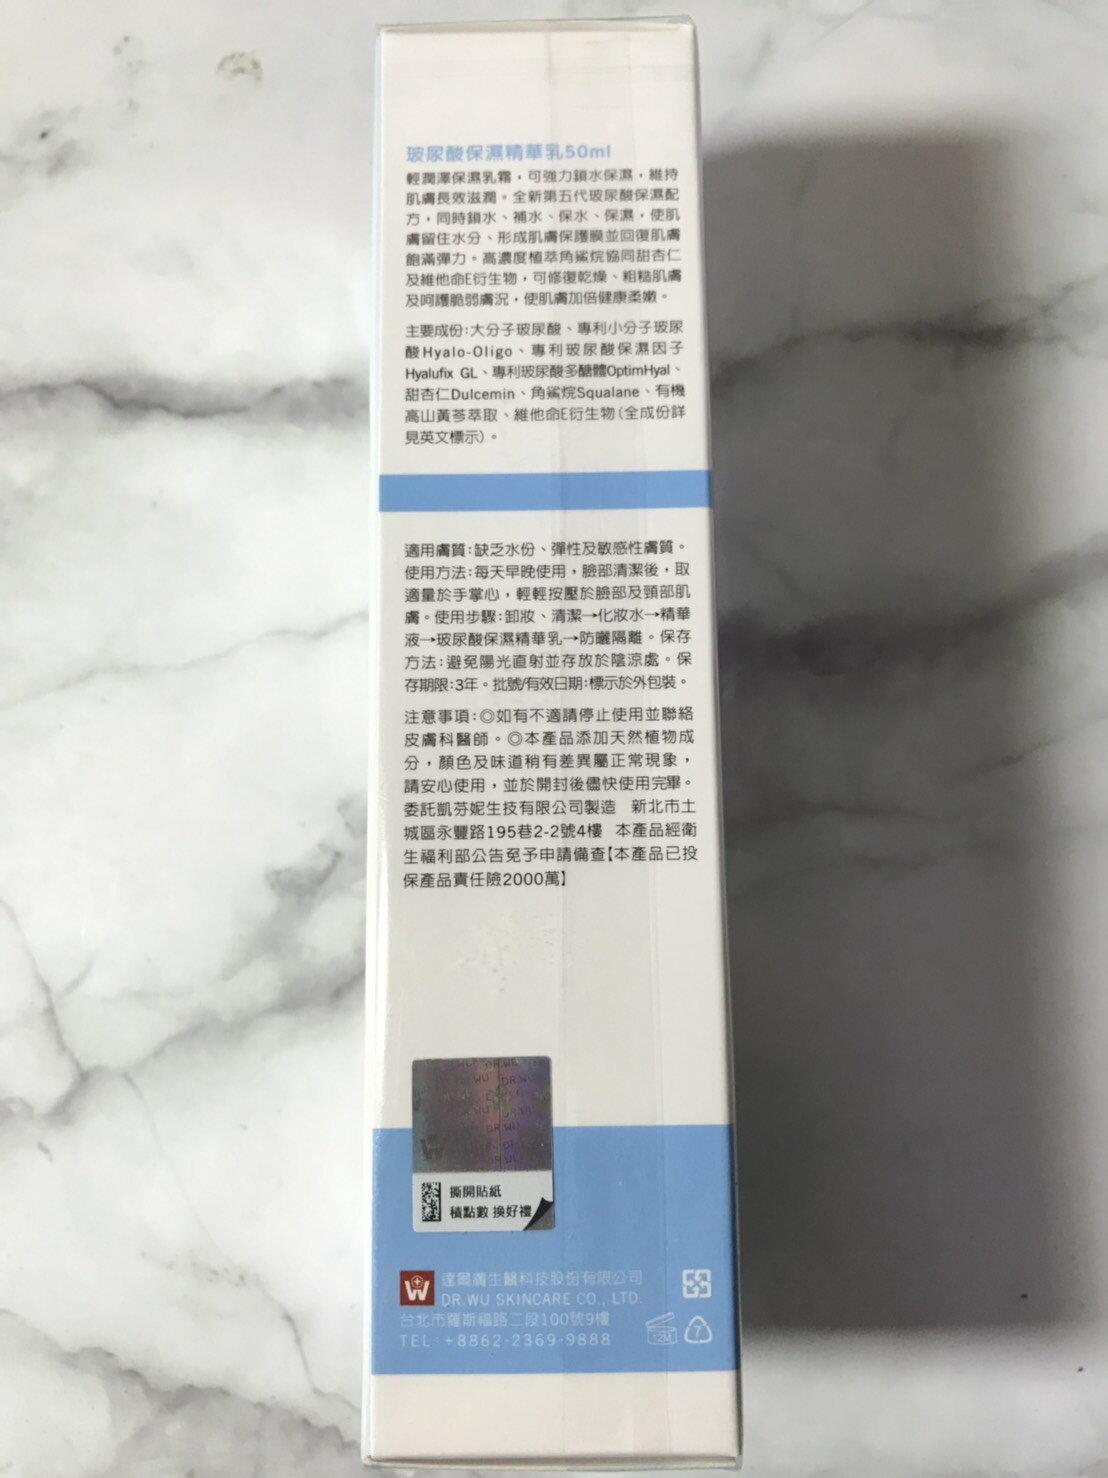 【DR. WU】 玻尿酸保濕精華乳 50ml 全新正貨盒裝封膜 / 效期2022.01【淨妍美肌】 1